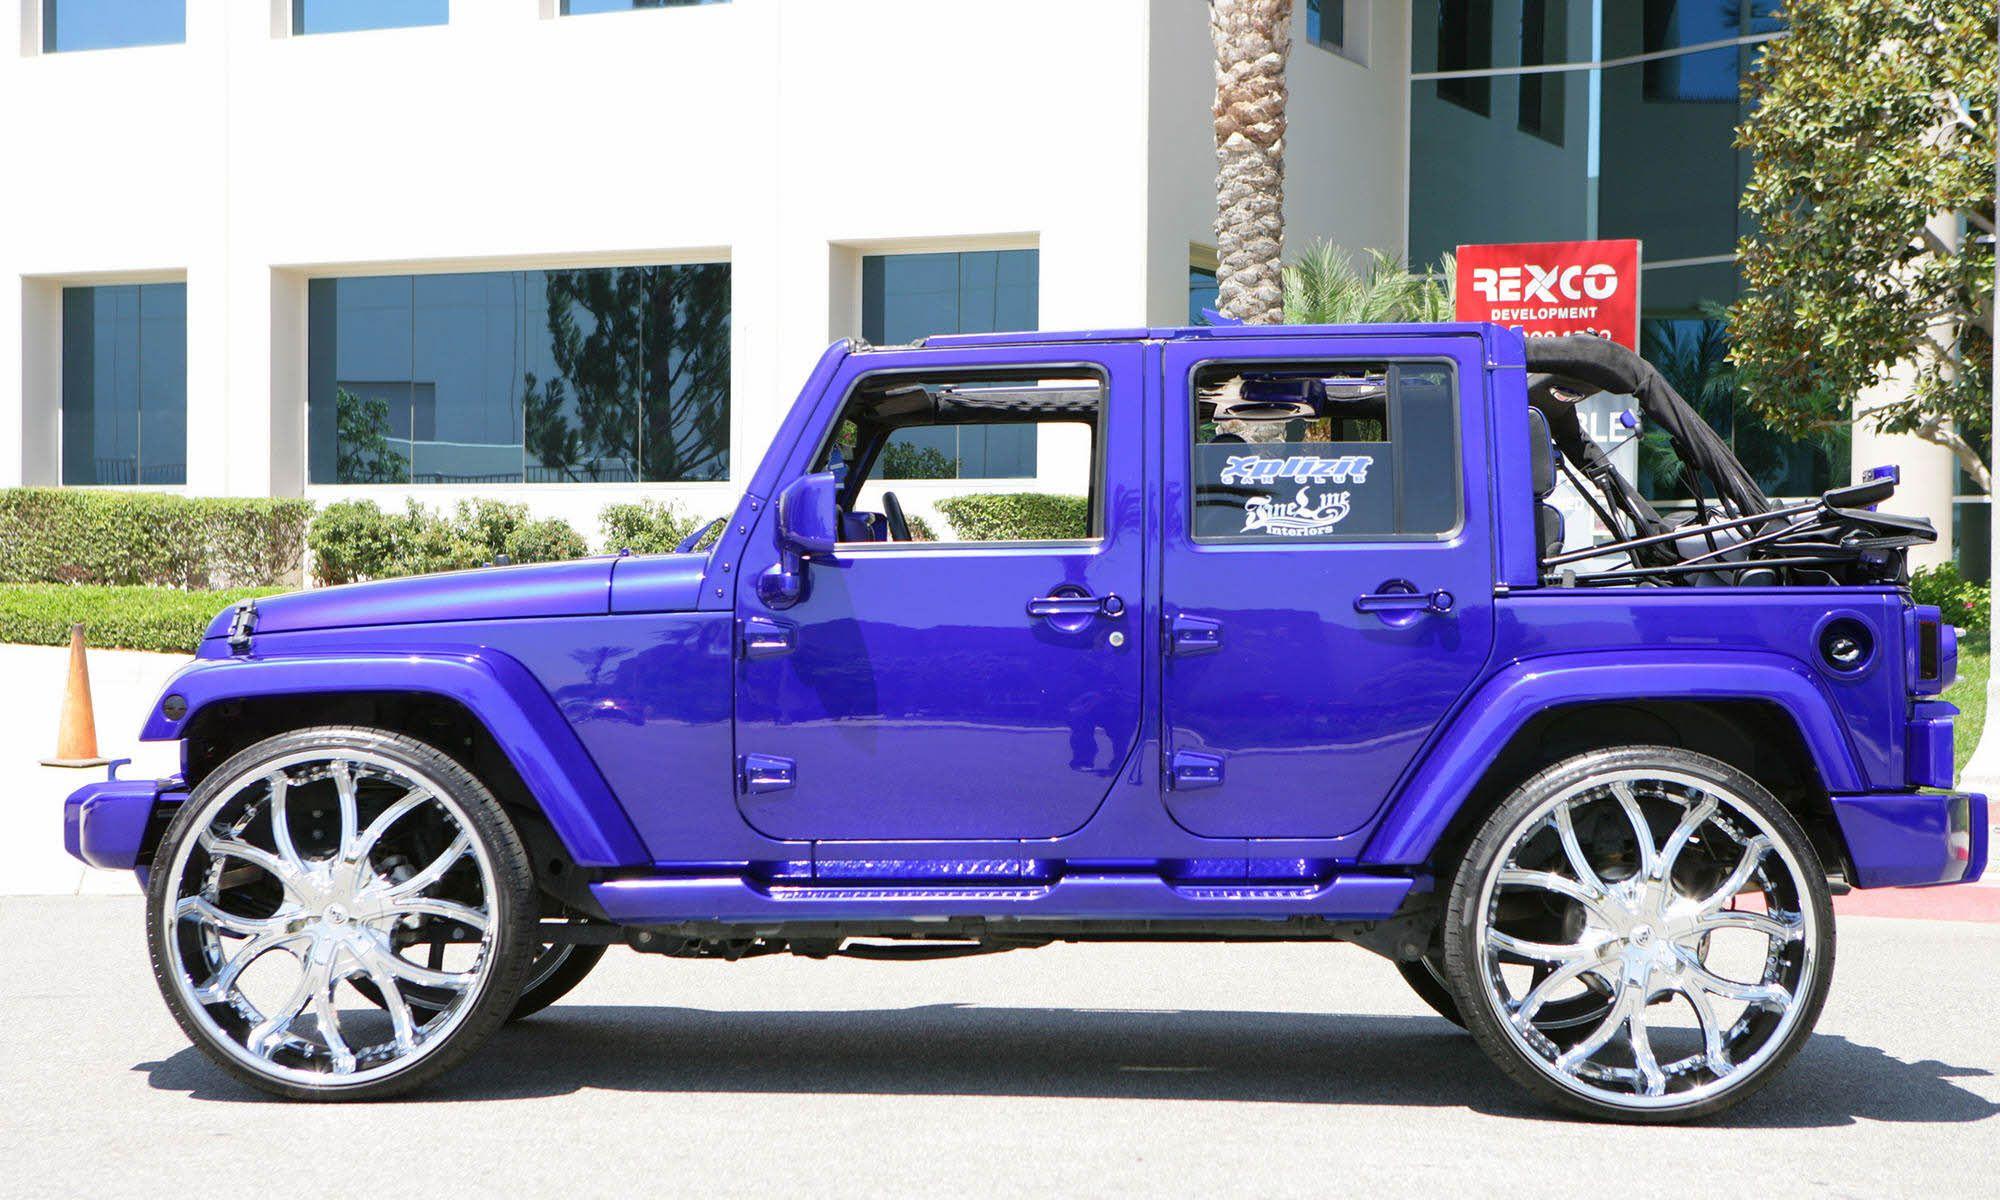 2010 jeep wrangler on 26's . . 26 inch, Big Wheel Cars